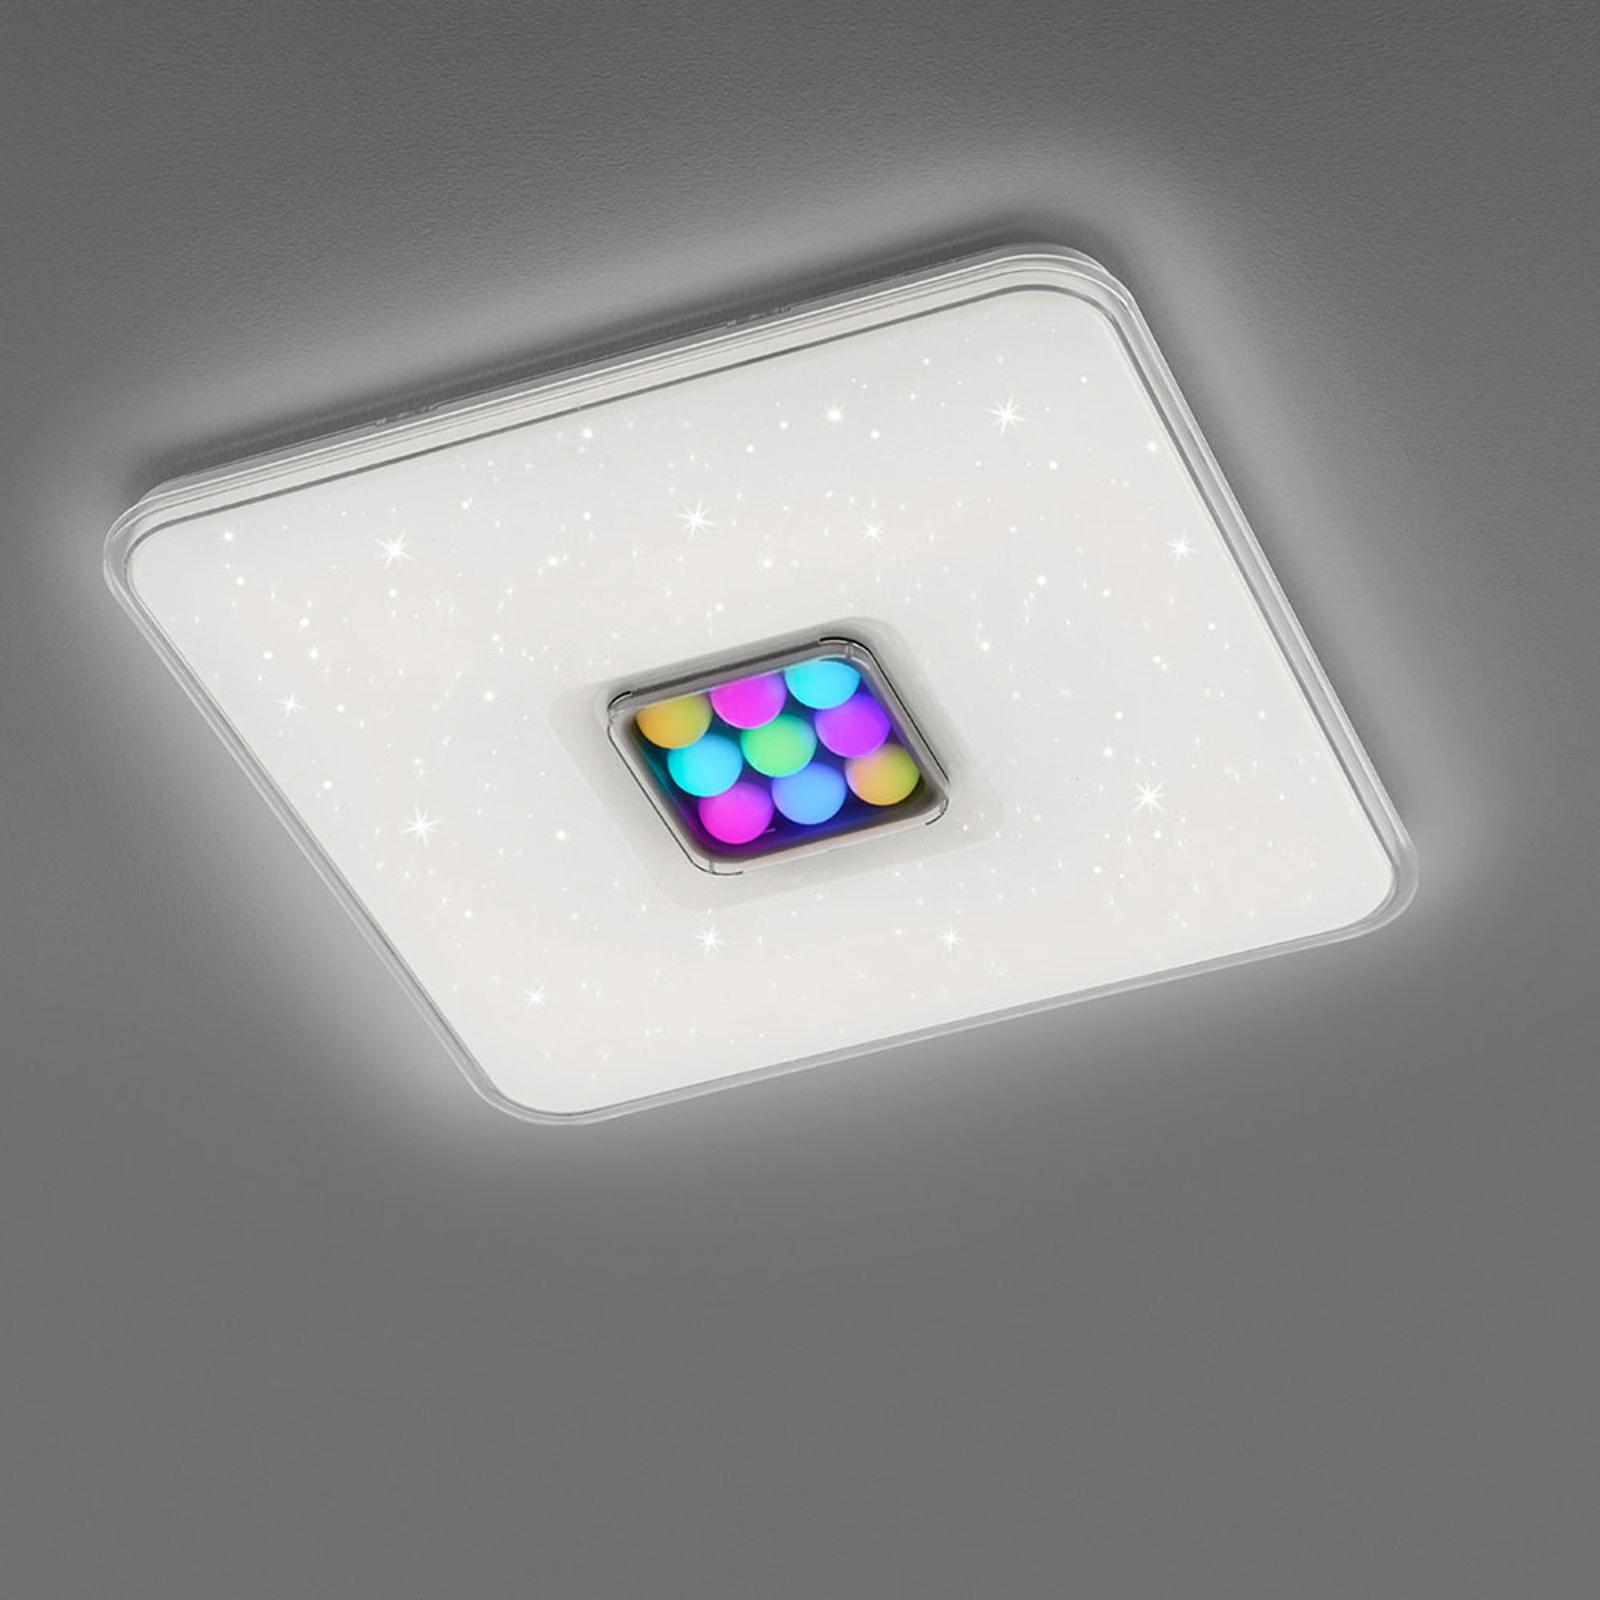 Lampa sufitowa LED Ogasaki, RGBW, pilot, 52cm